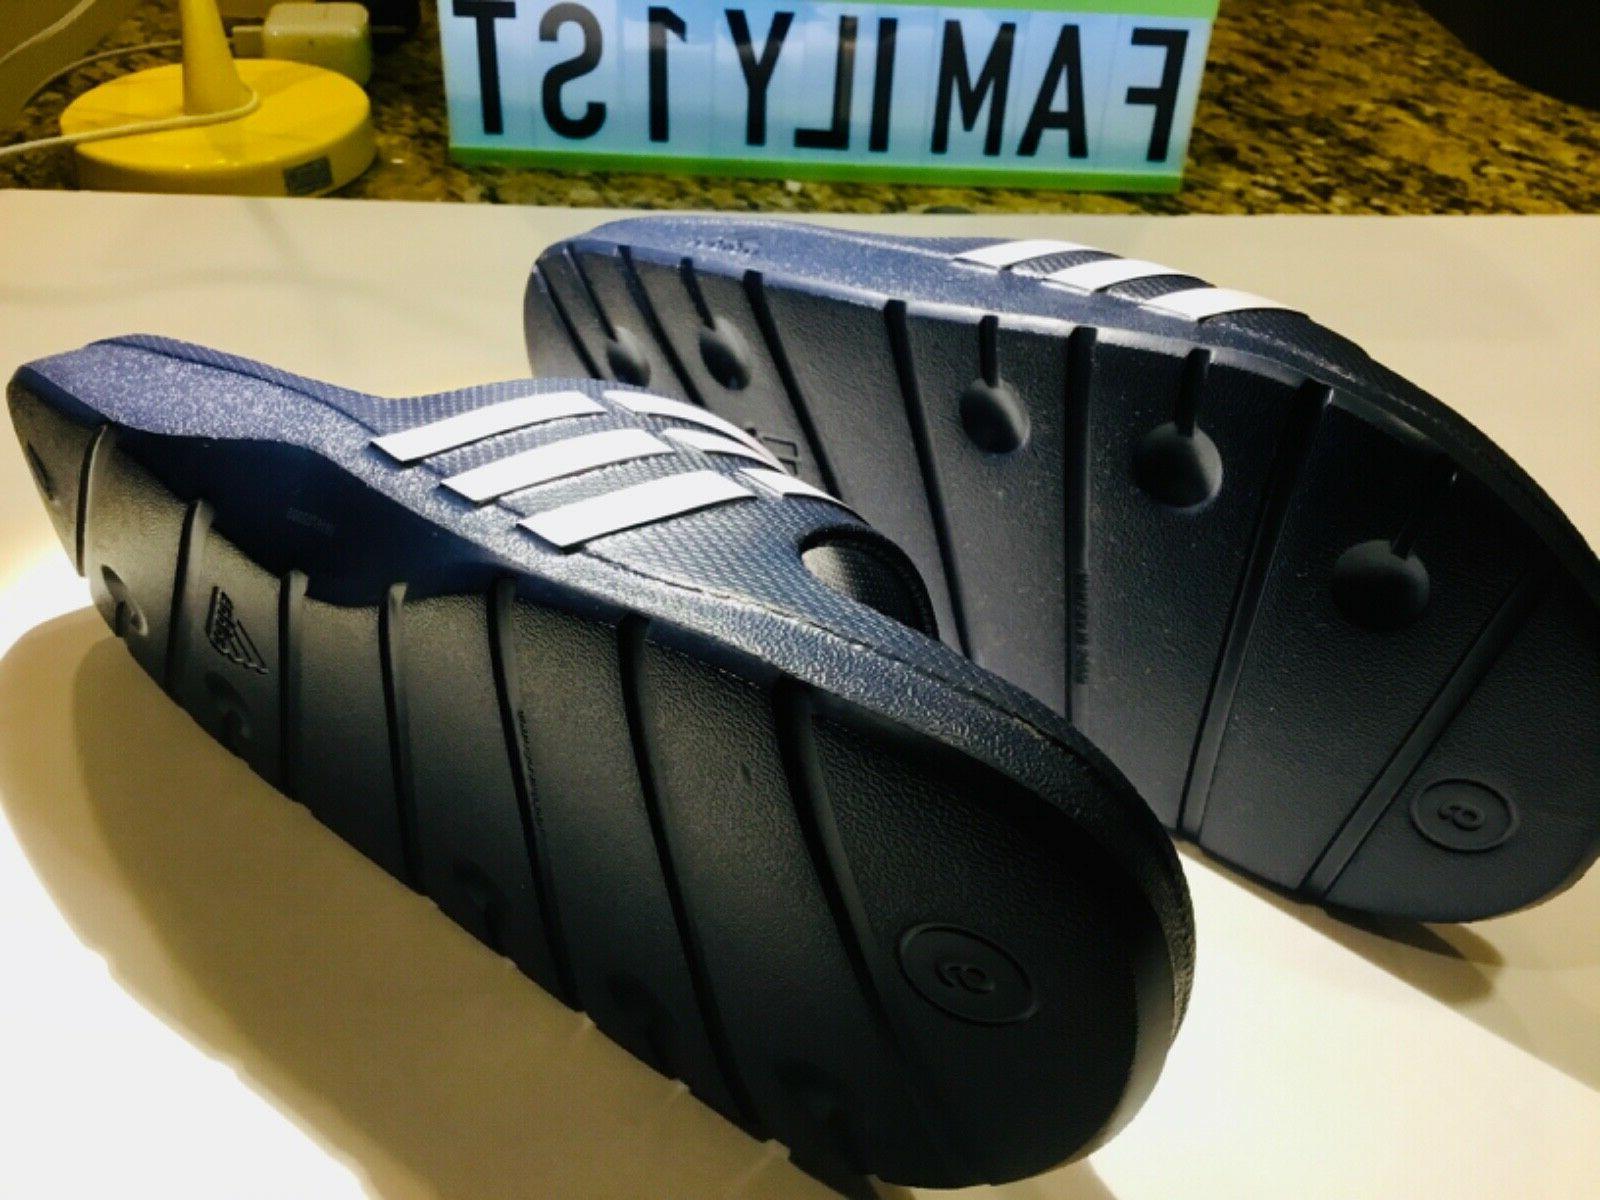 Adidas Duramo Slides Sandals Flip Flops Beach Wear Navy